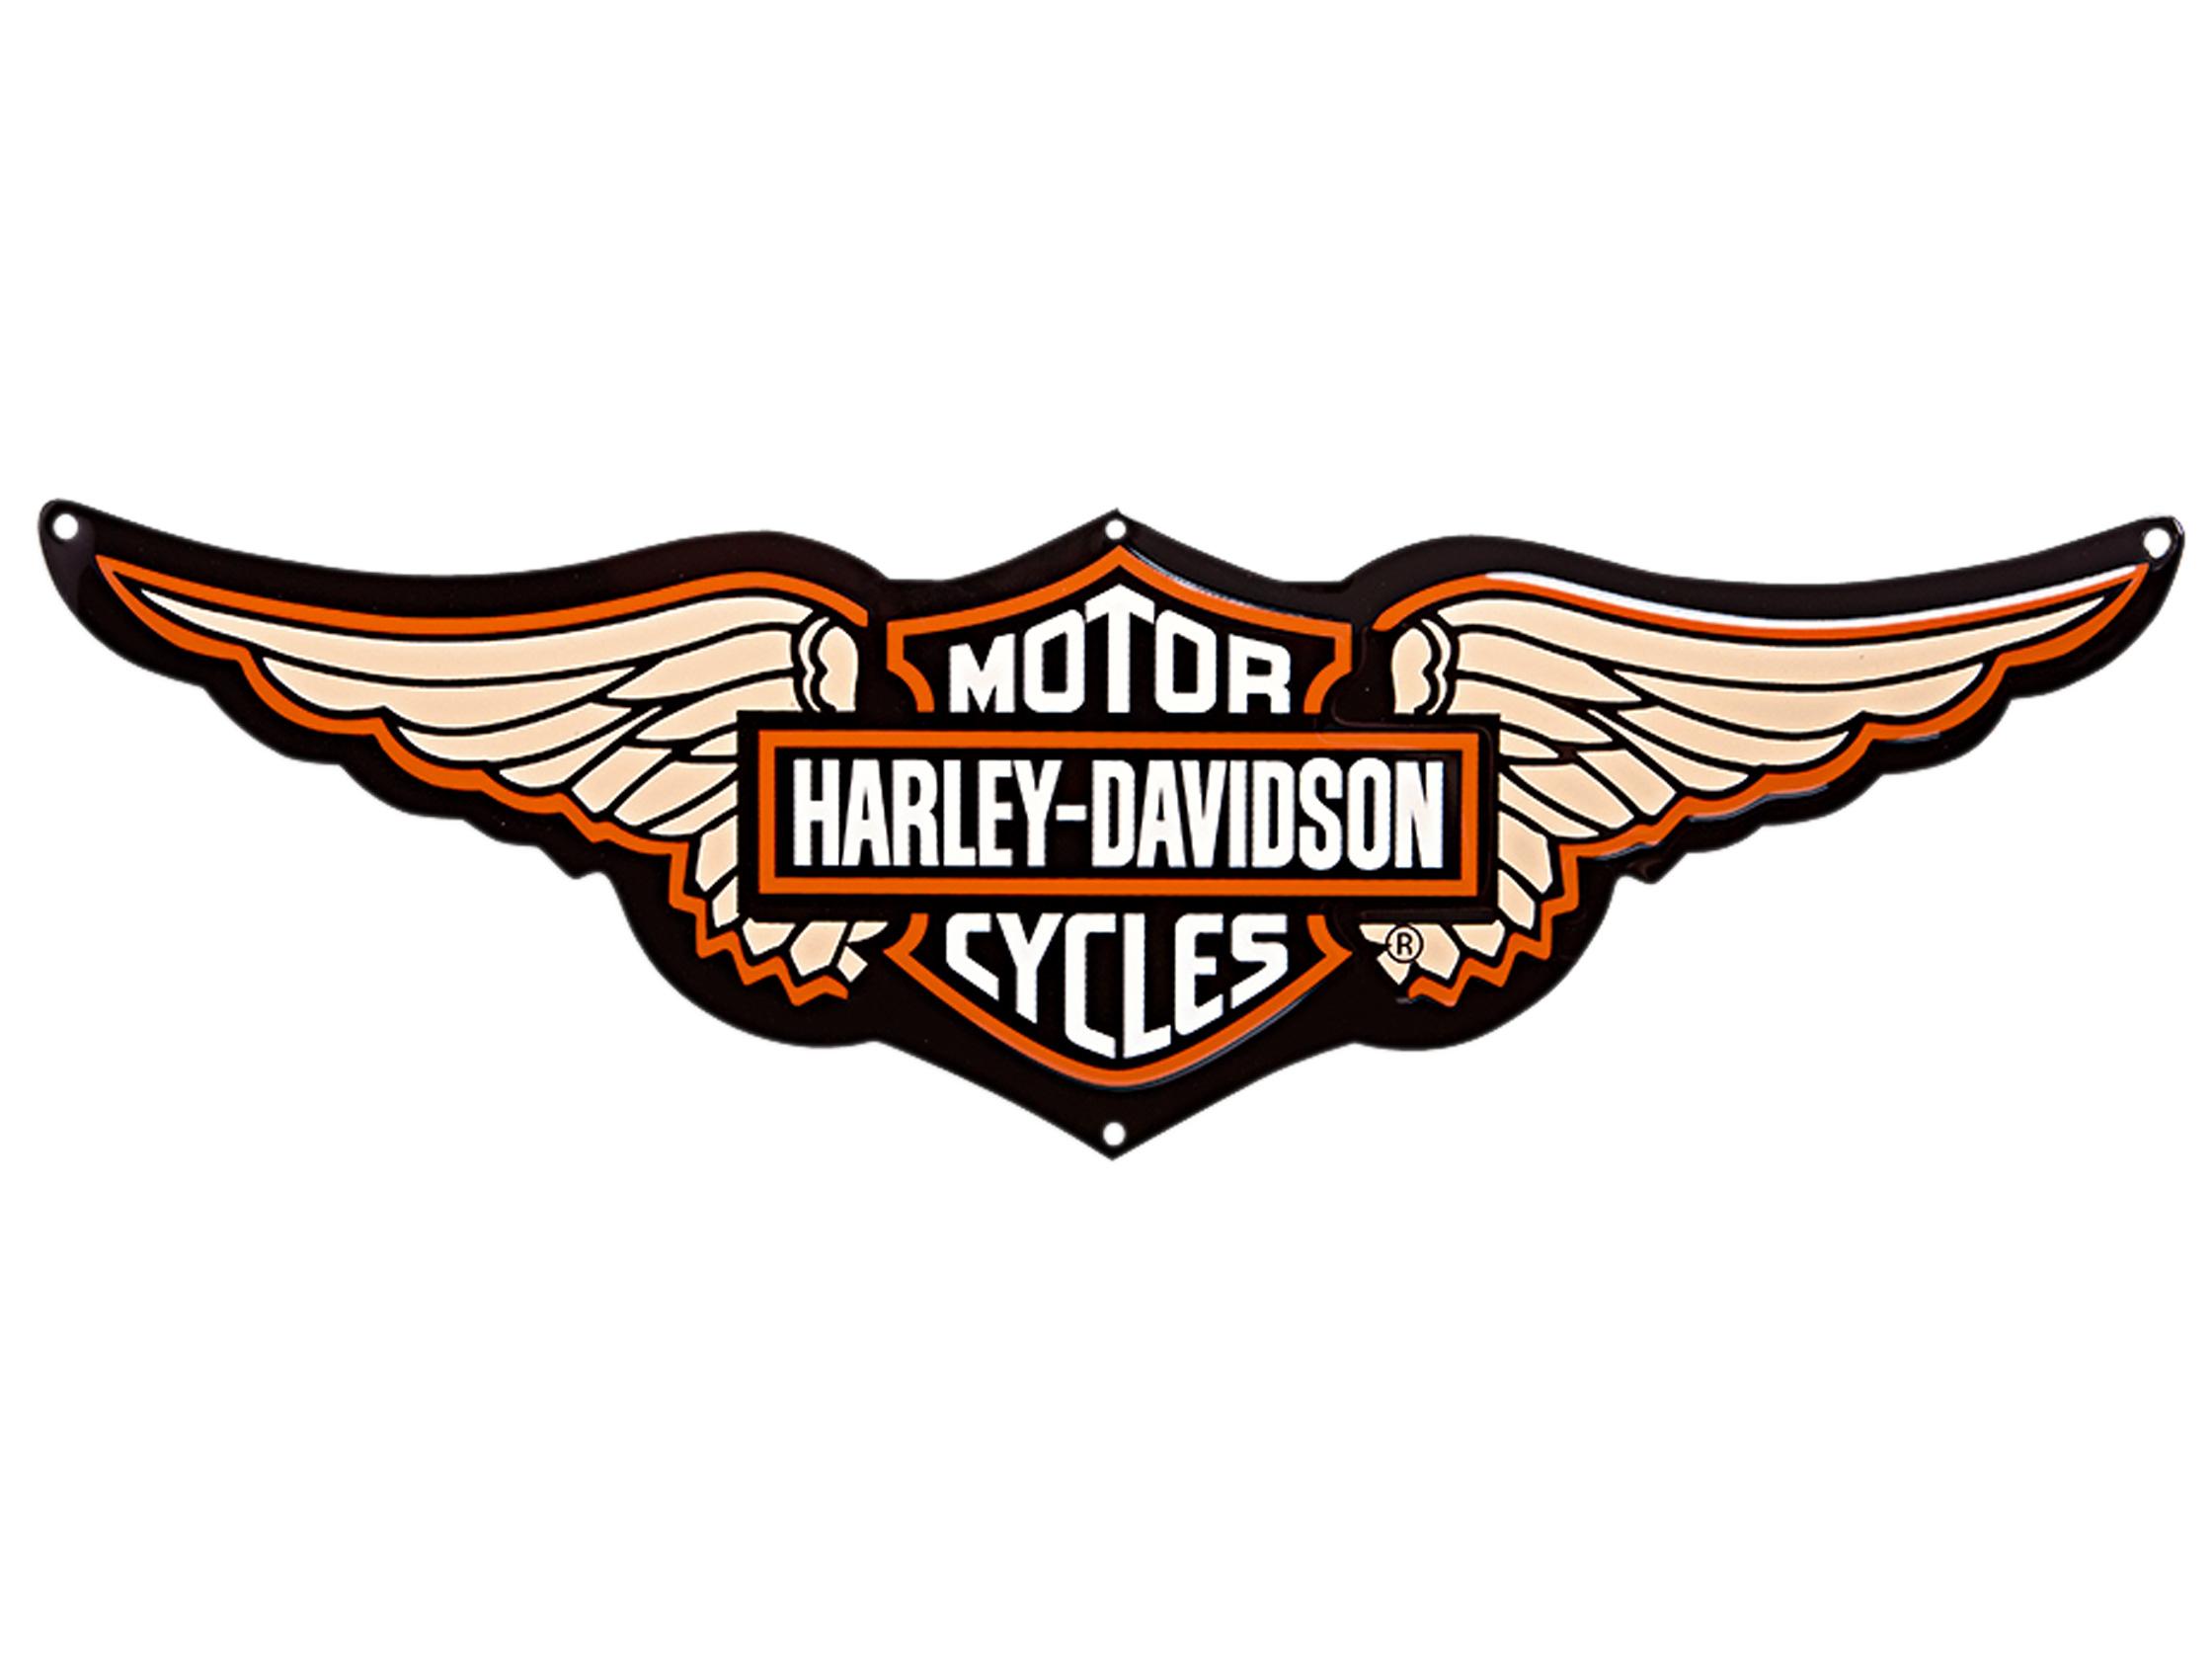 Harley davidson logo clipart jpg library stock Harley davidson logo clipart - ClipartFest jpg library stock